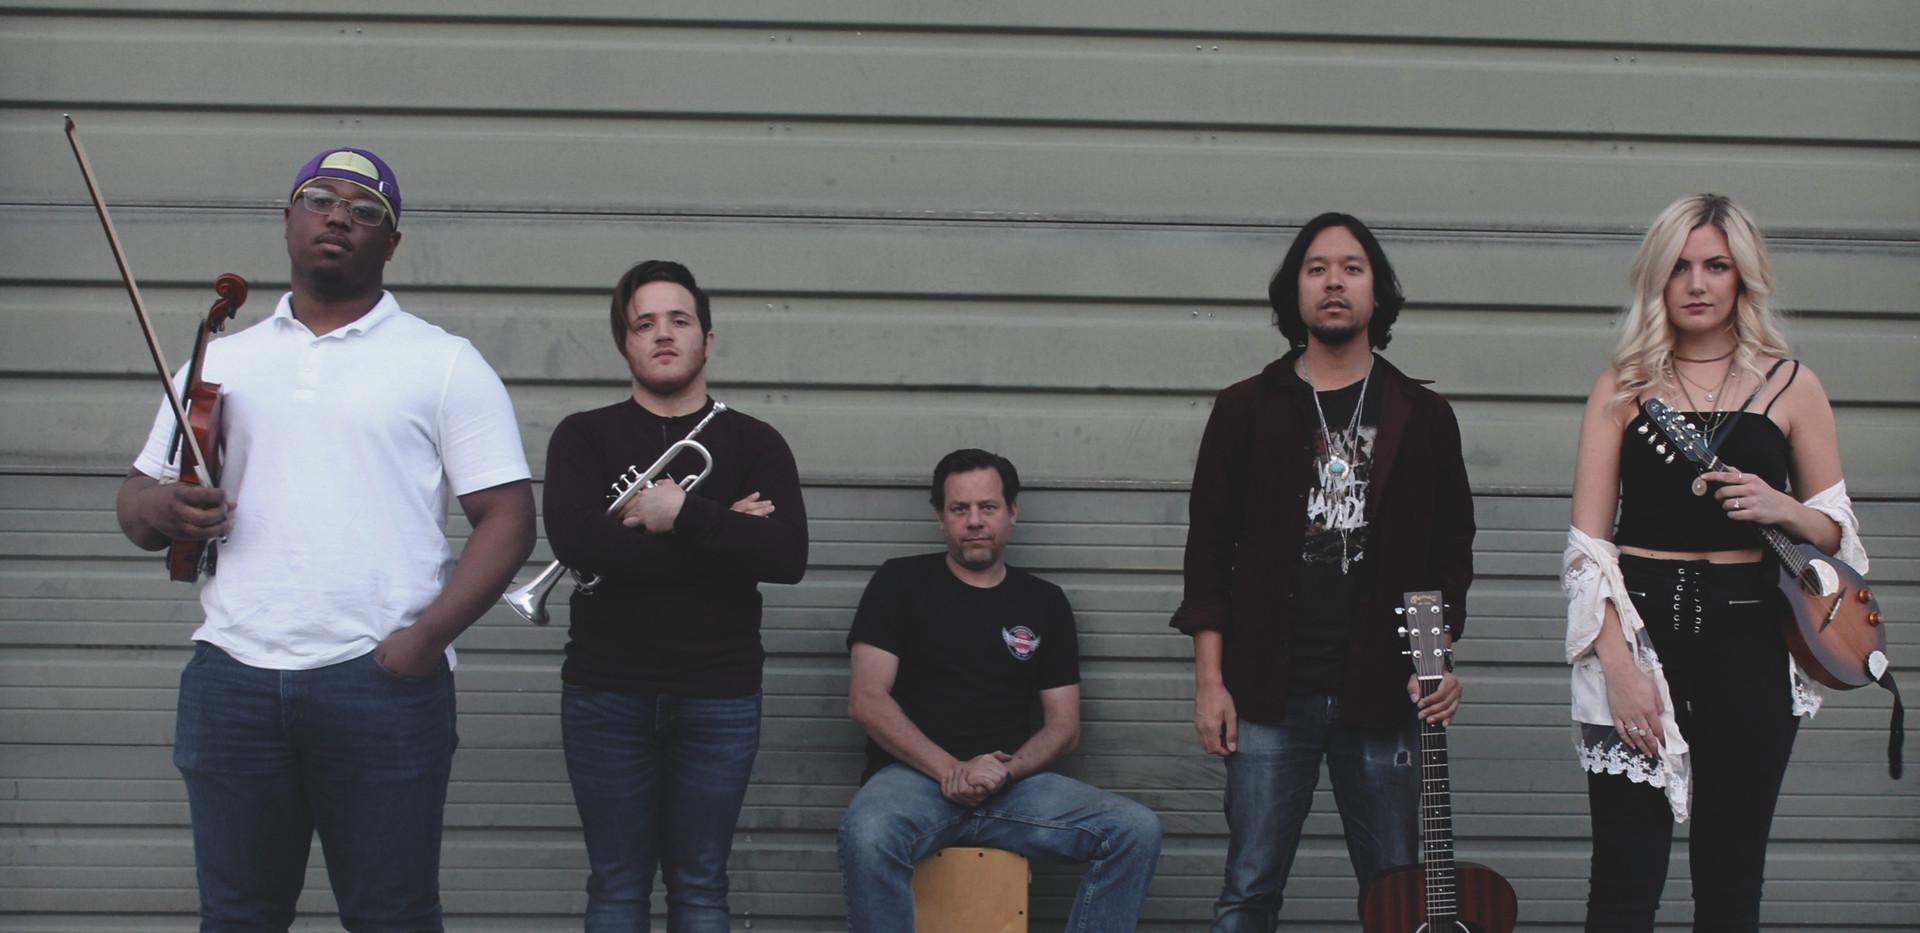 90s Grunge Rock Vibes